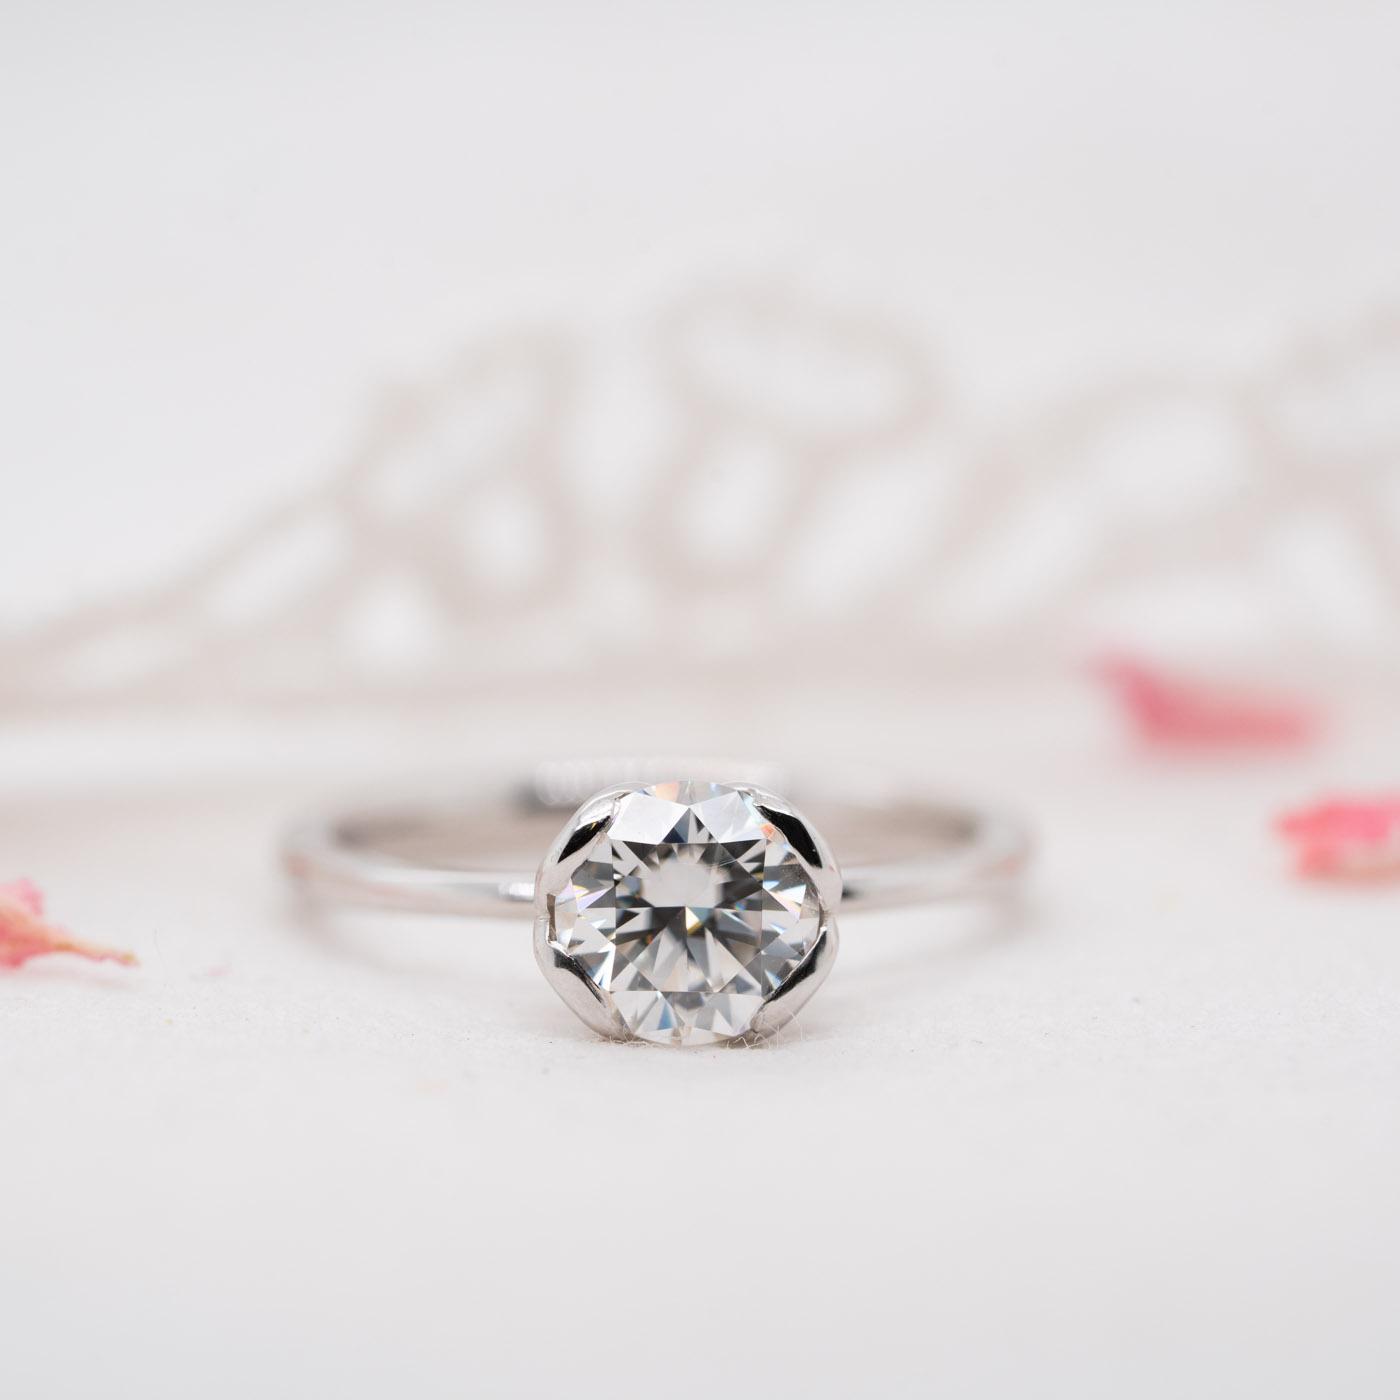 Ethically Sourced Diamond Engagement Ring | Callis | Ethica Diamonds